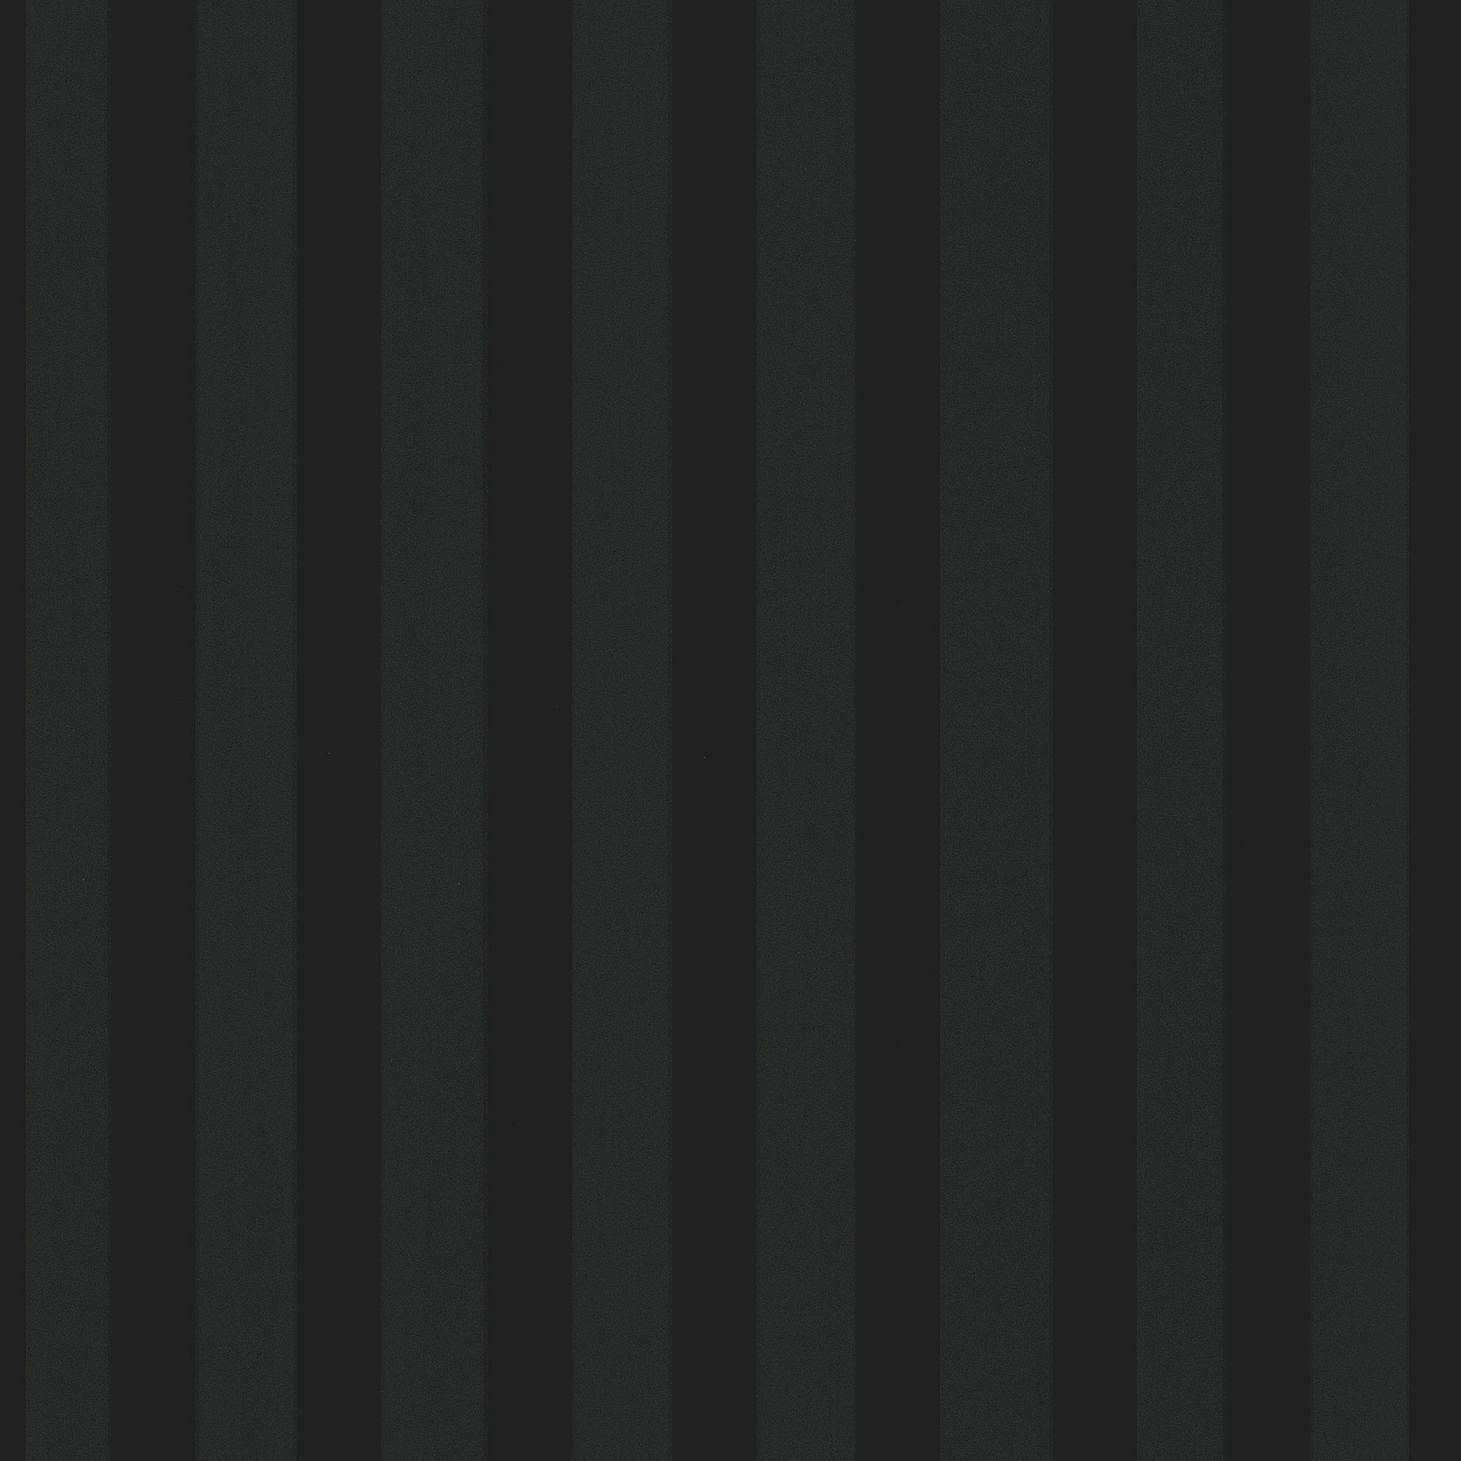 Essener Tapete Simply Stripes 3 Ns24916 black Strisce Righe Tappezzeria in Vinile